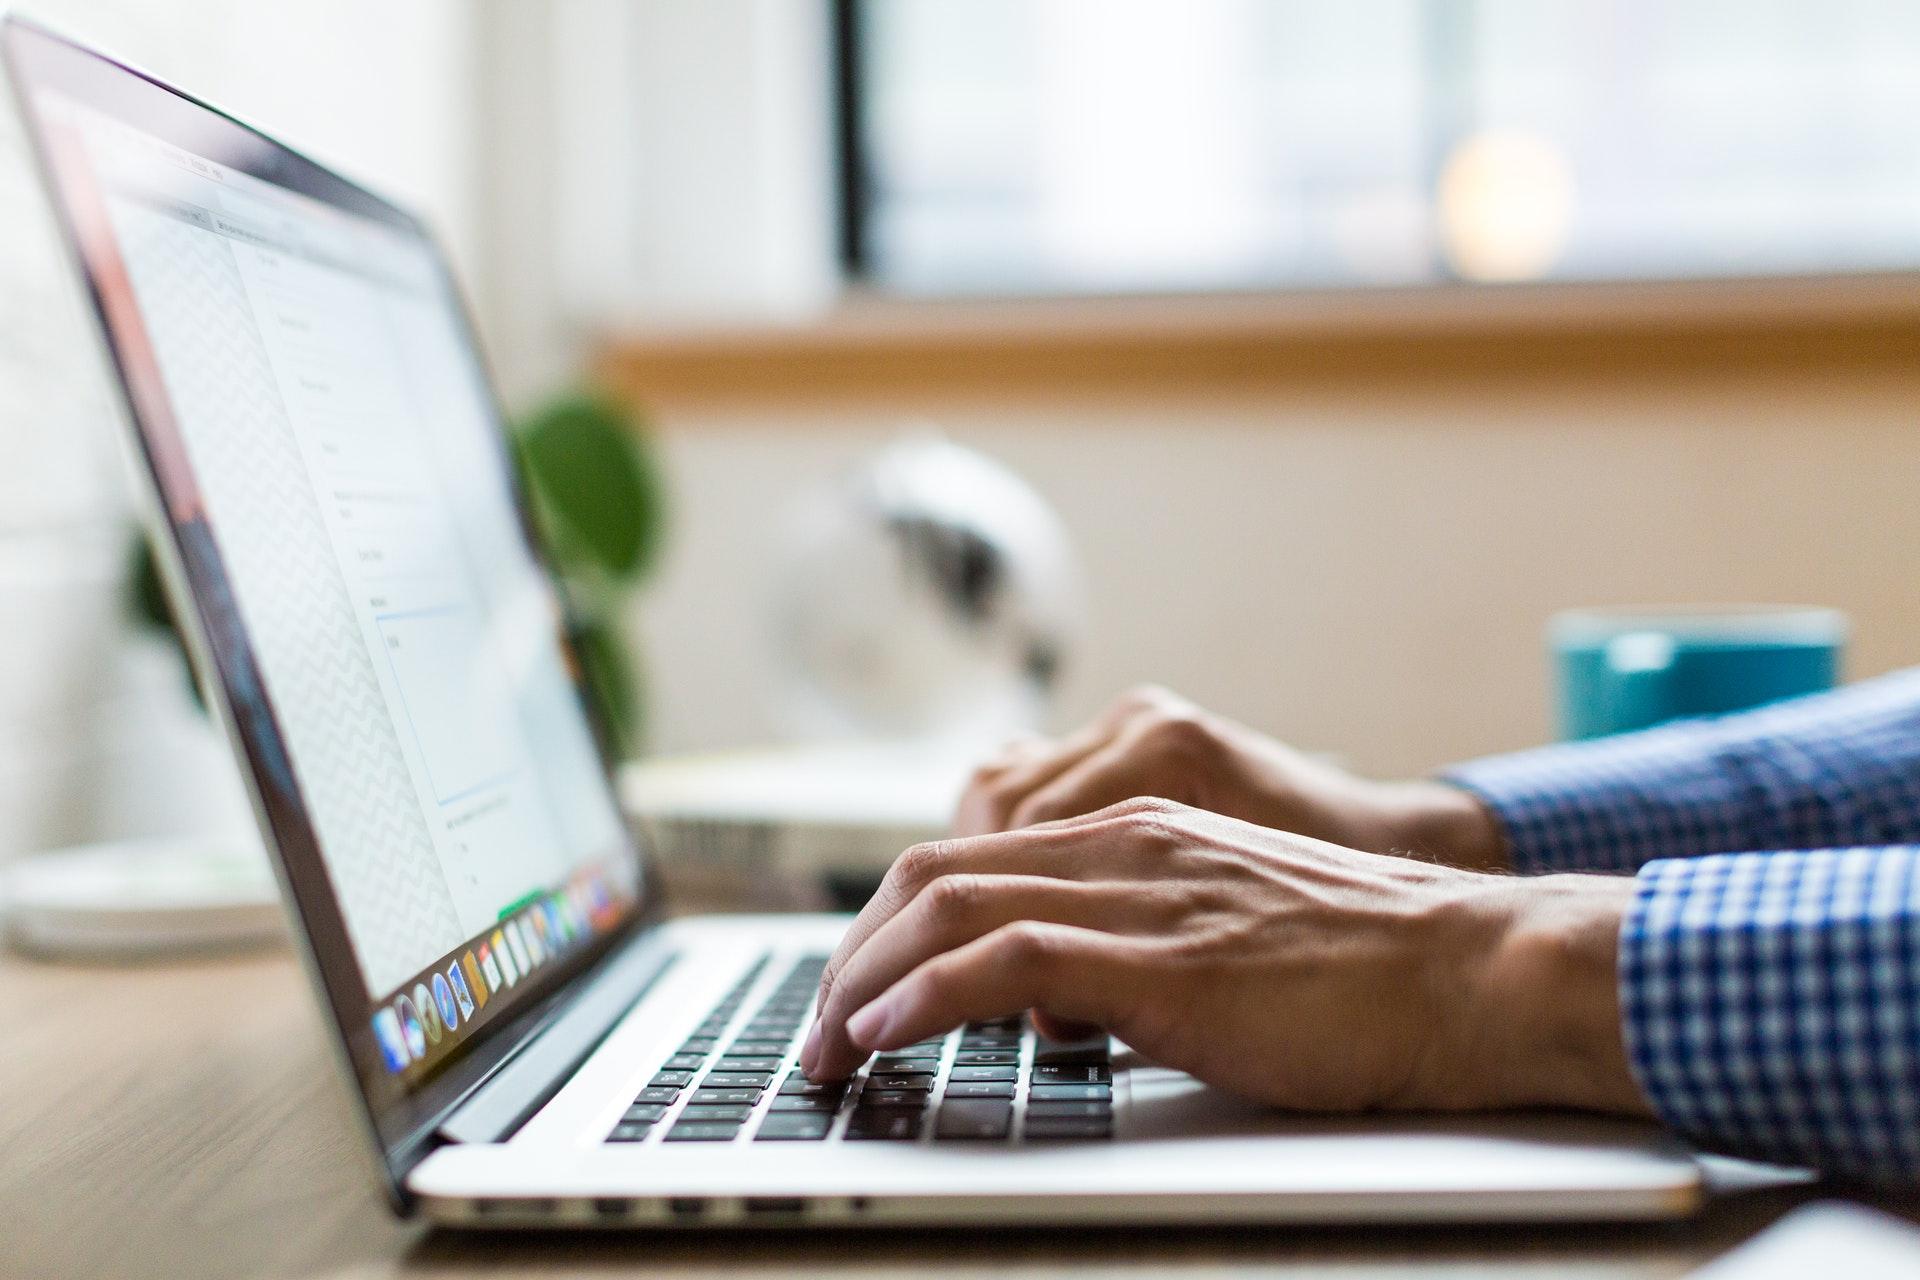 Oxford Life announces an all E-Application platform for life insurance